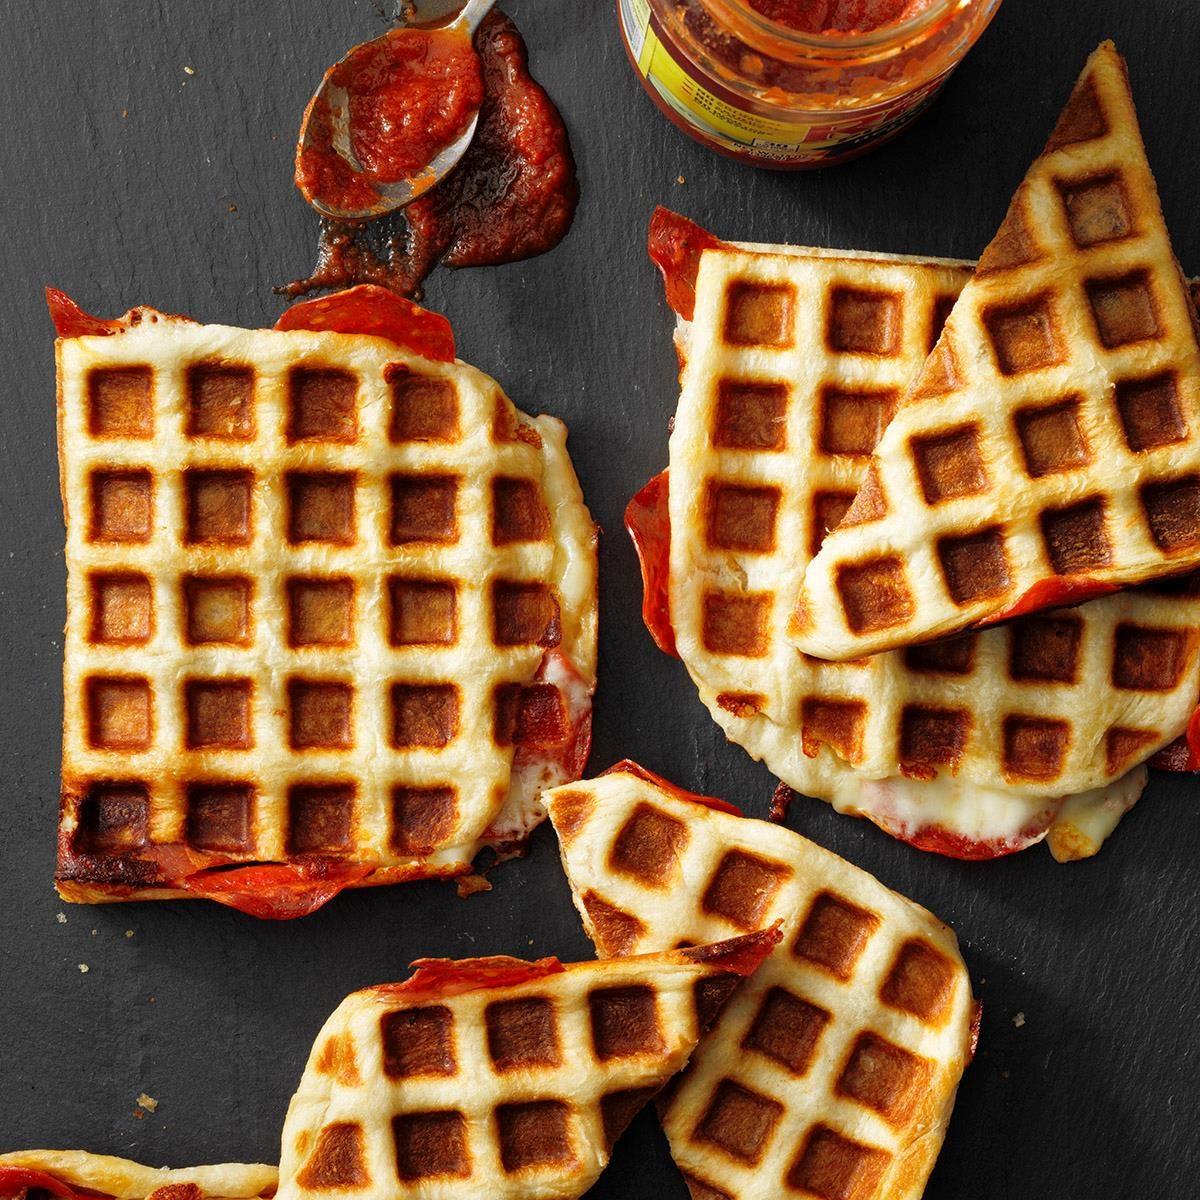 Day 2: Waffle-Iron Pizzas